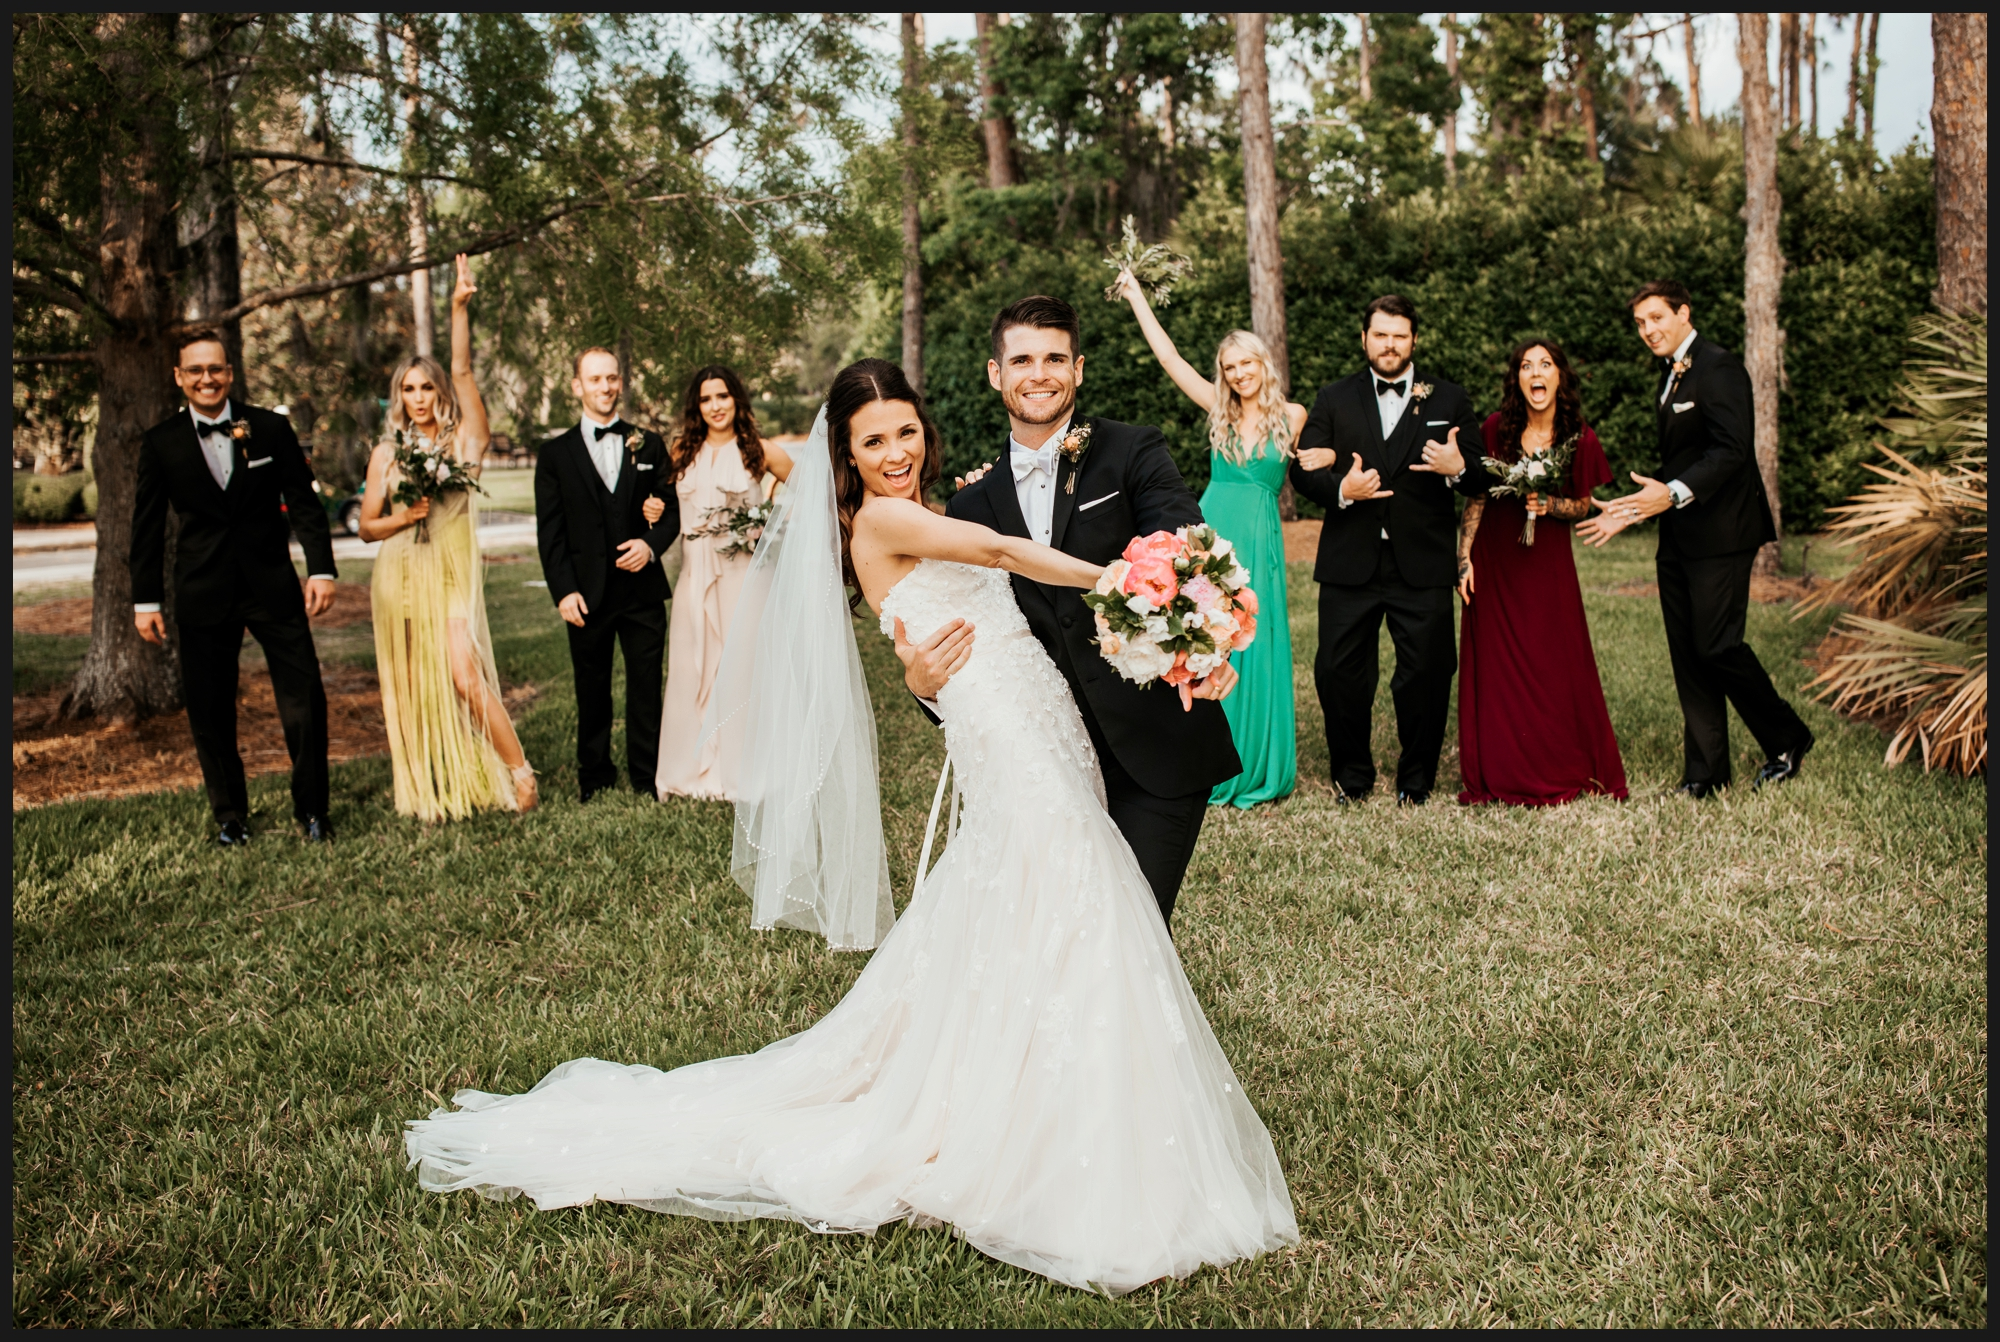 Orlando-Wedding-Photographer-destination-wedding-photographer-florida-wedding-photographer-hawaii-wedding-photographer_0234.jpg